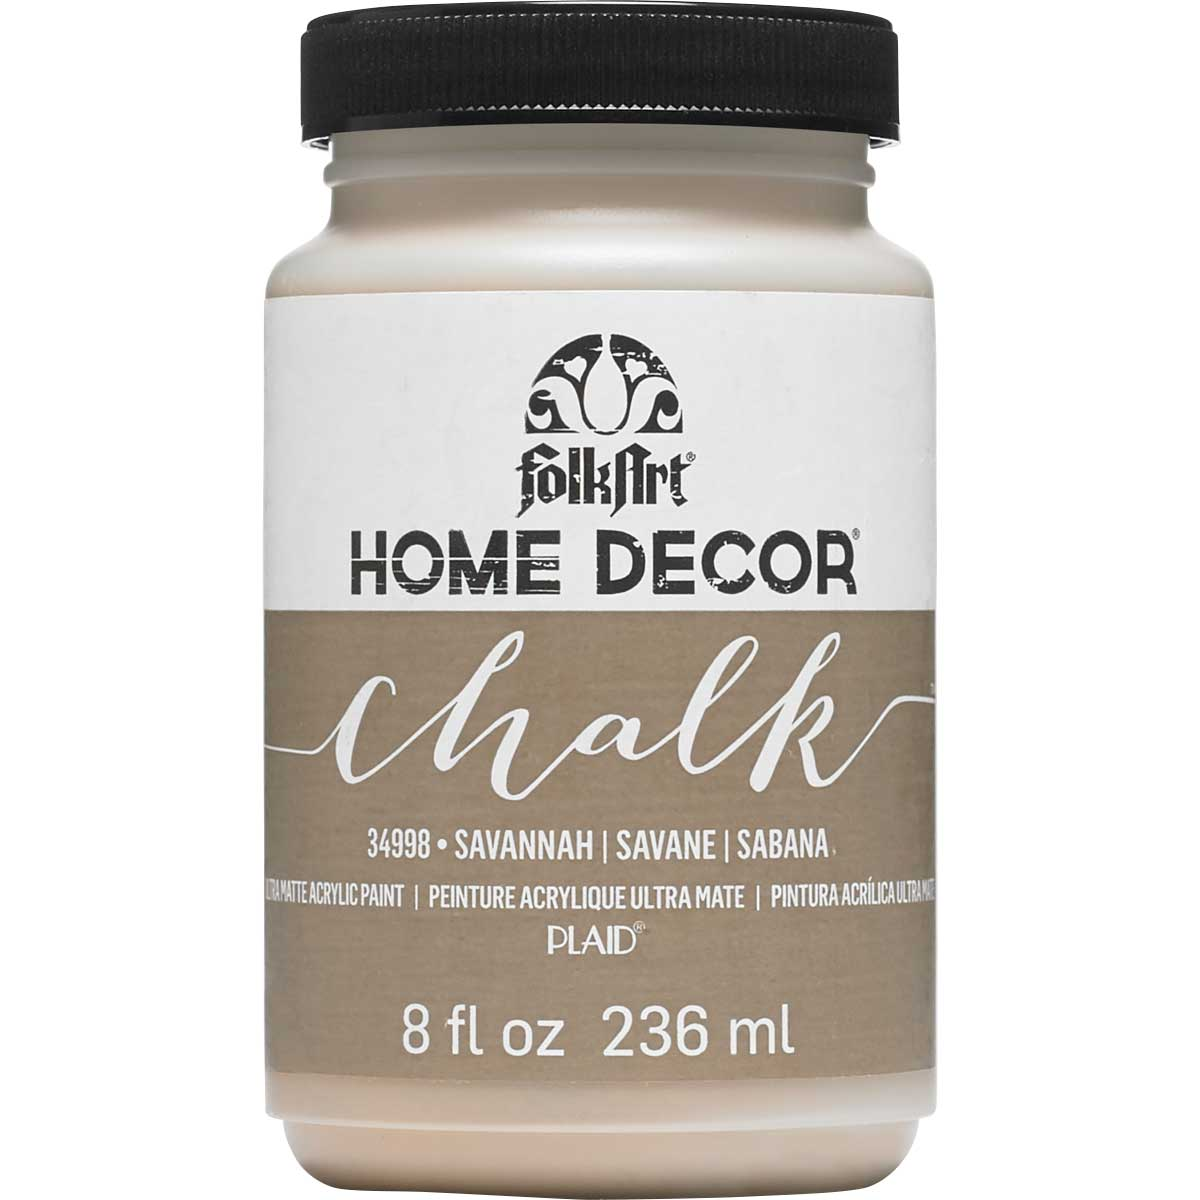 Plaid Folkart Home Decor Chalk